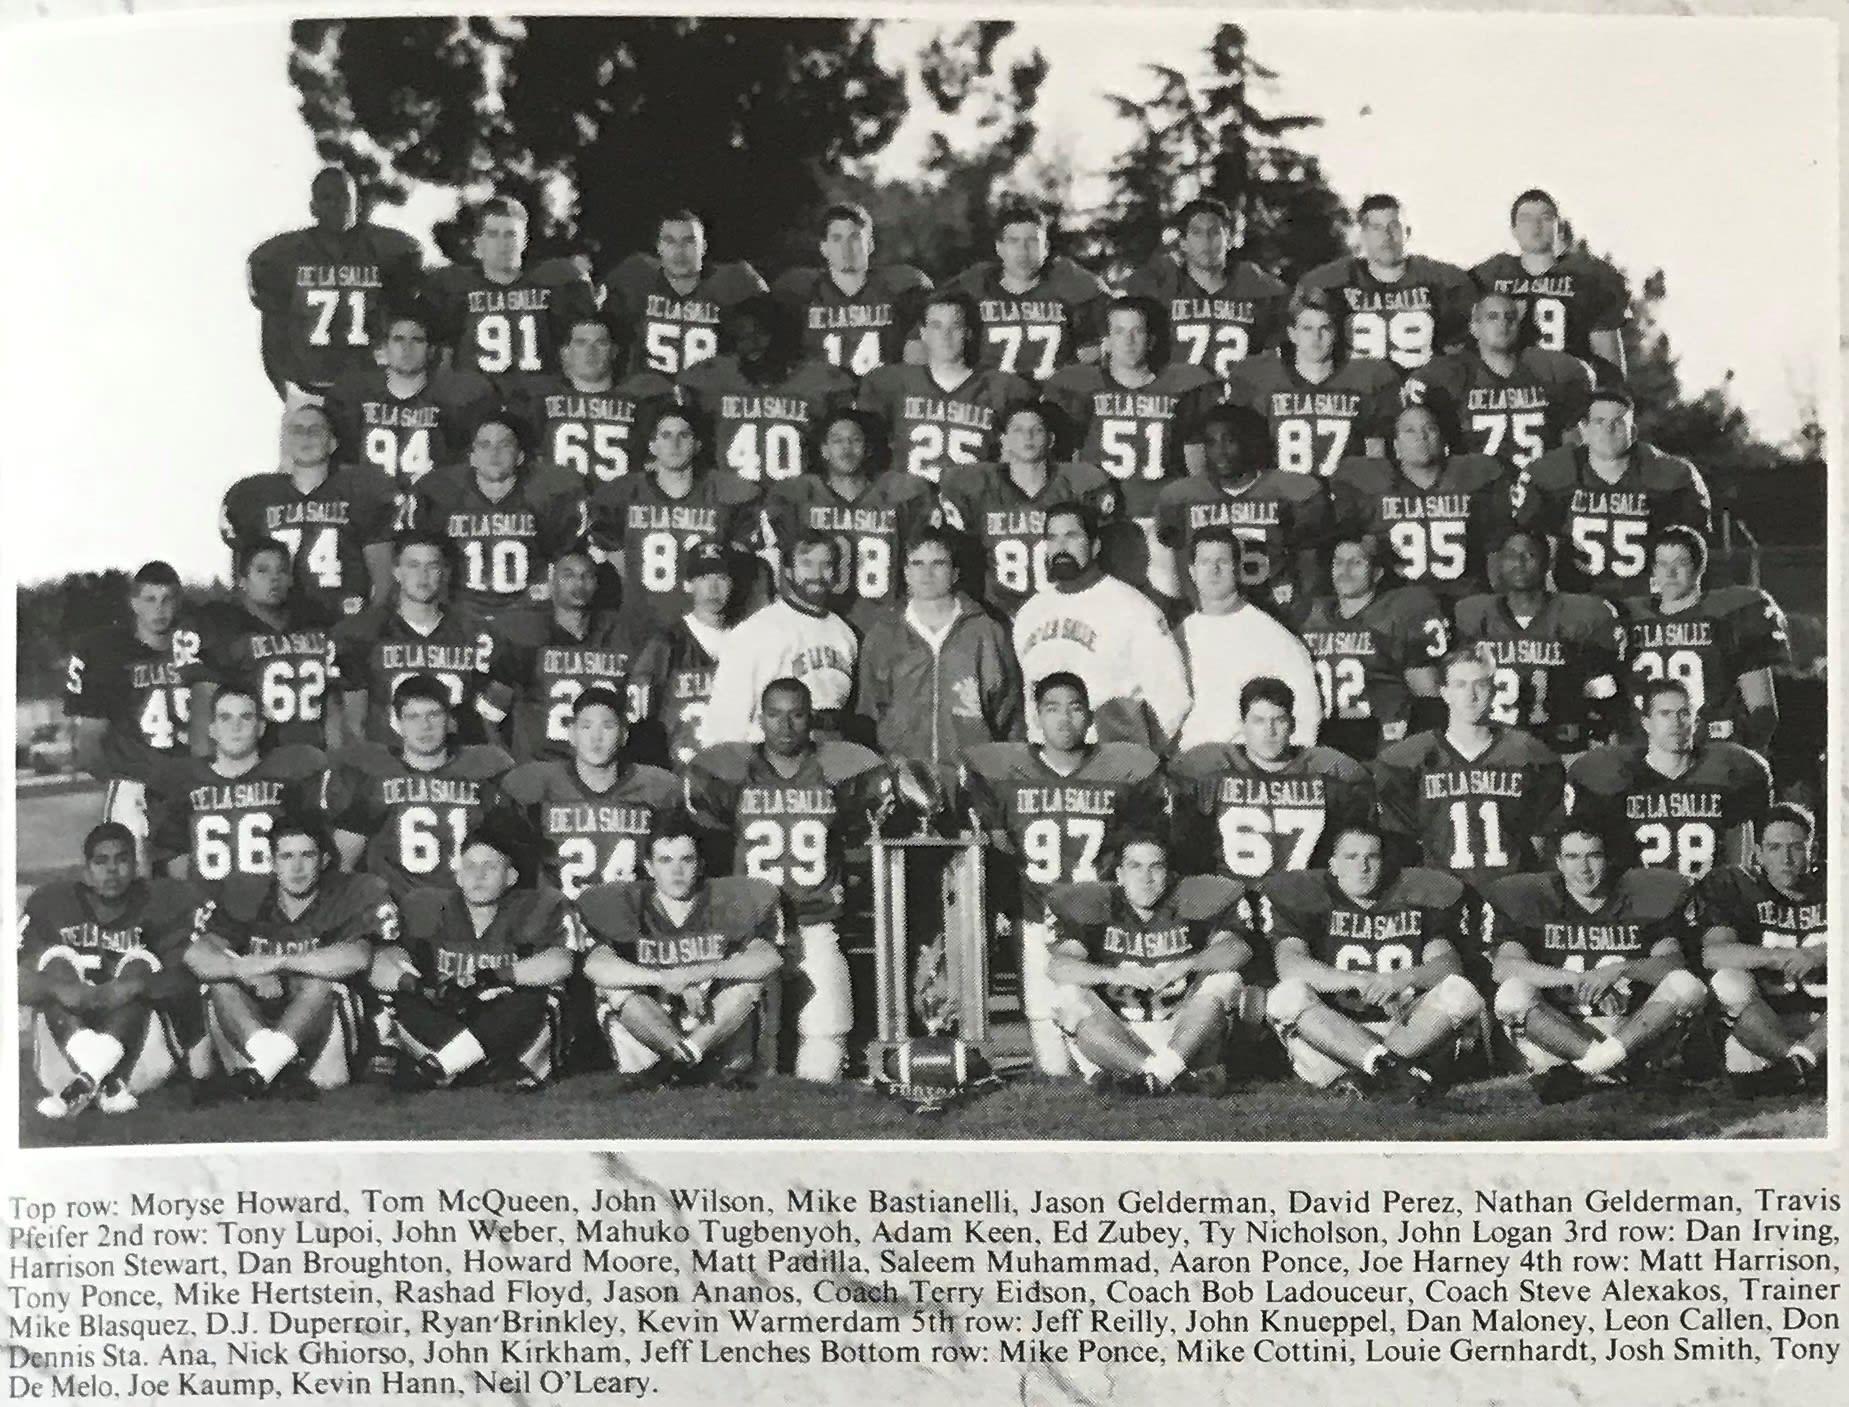 1994 Football Team Photo